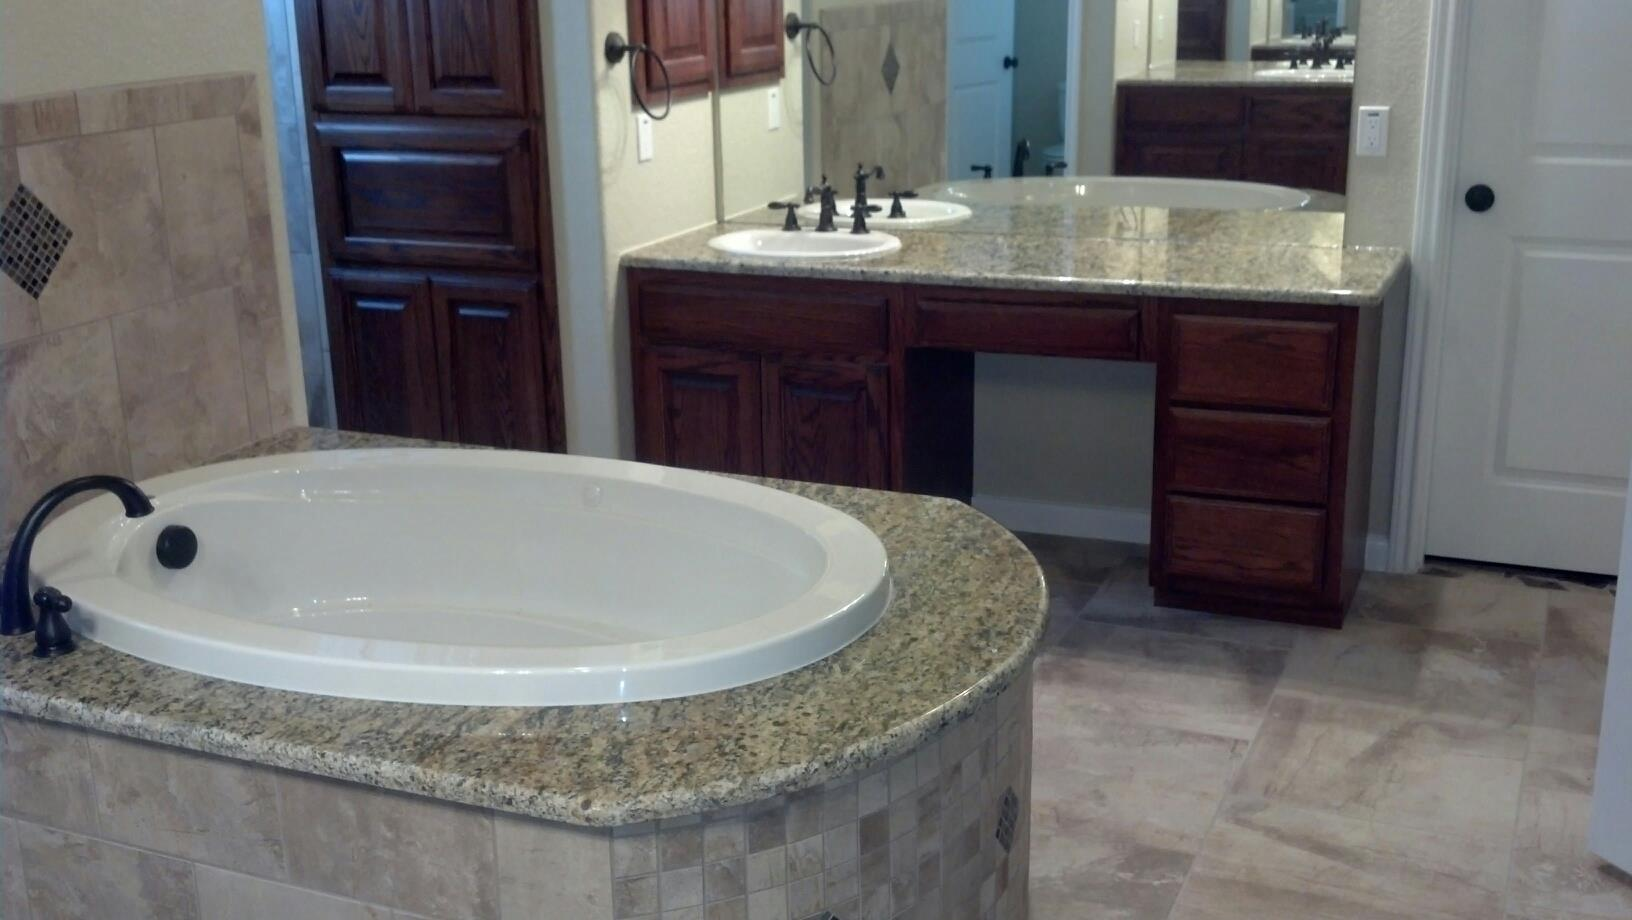 Granite Counter Tops Fabrication And Installation Ms Granite - Bathroom countertops san antonio